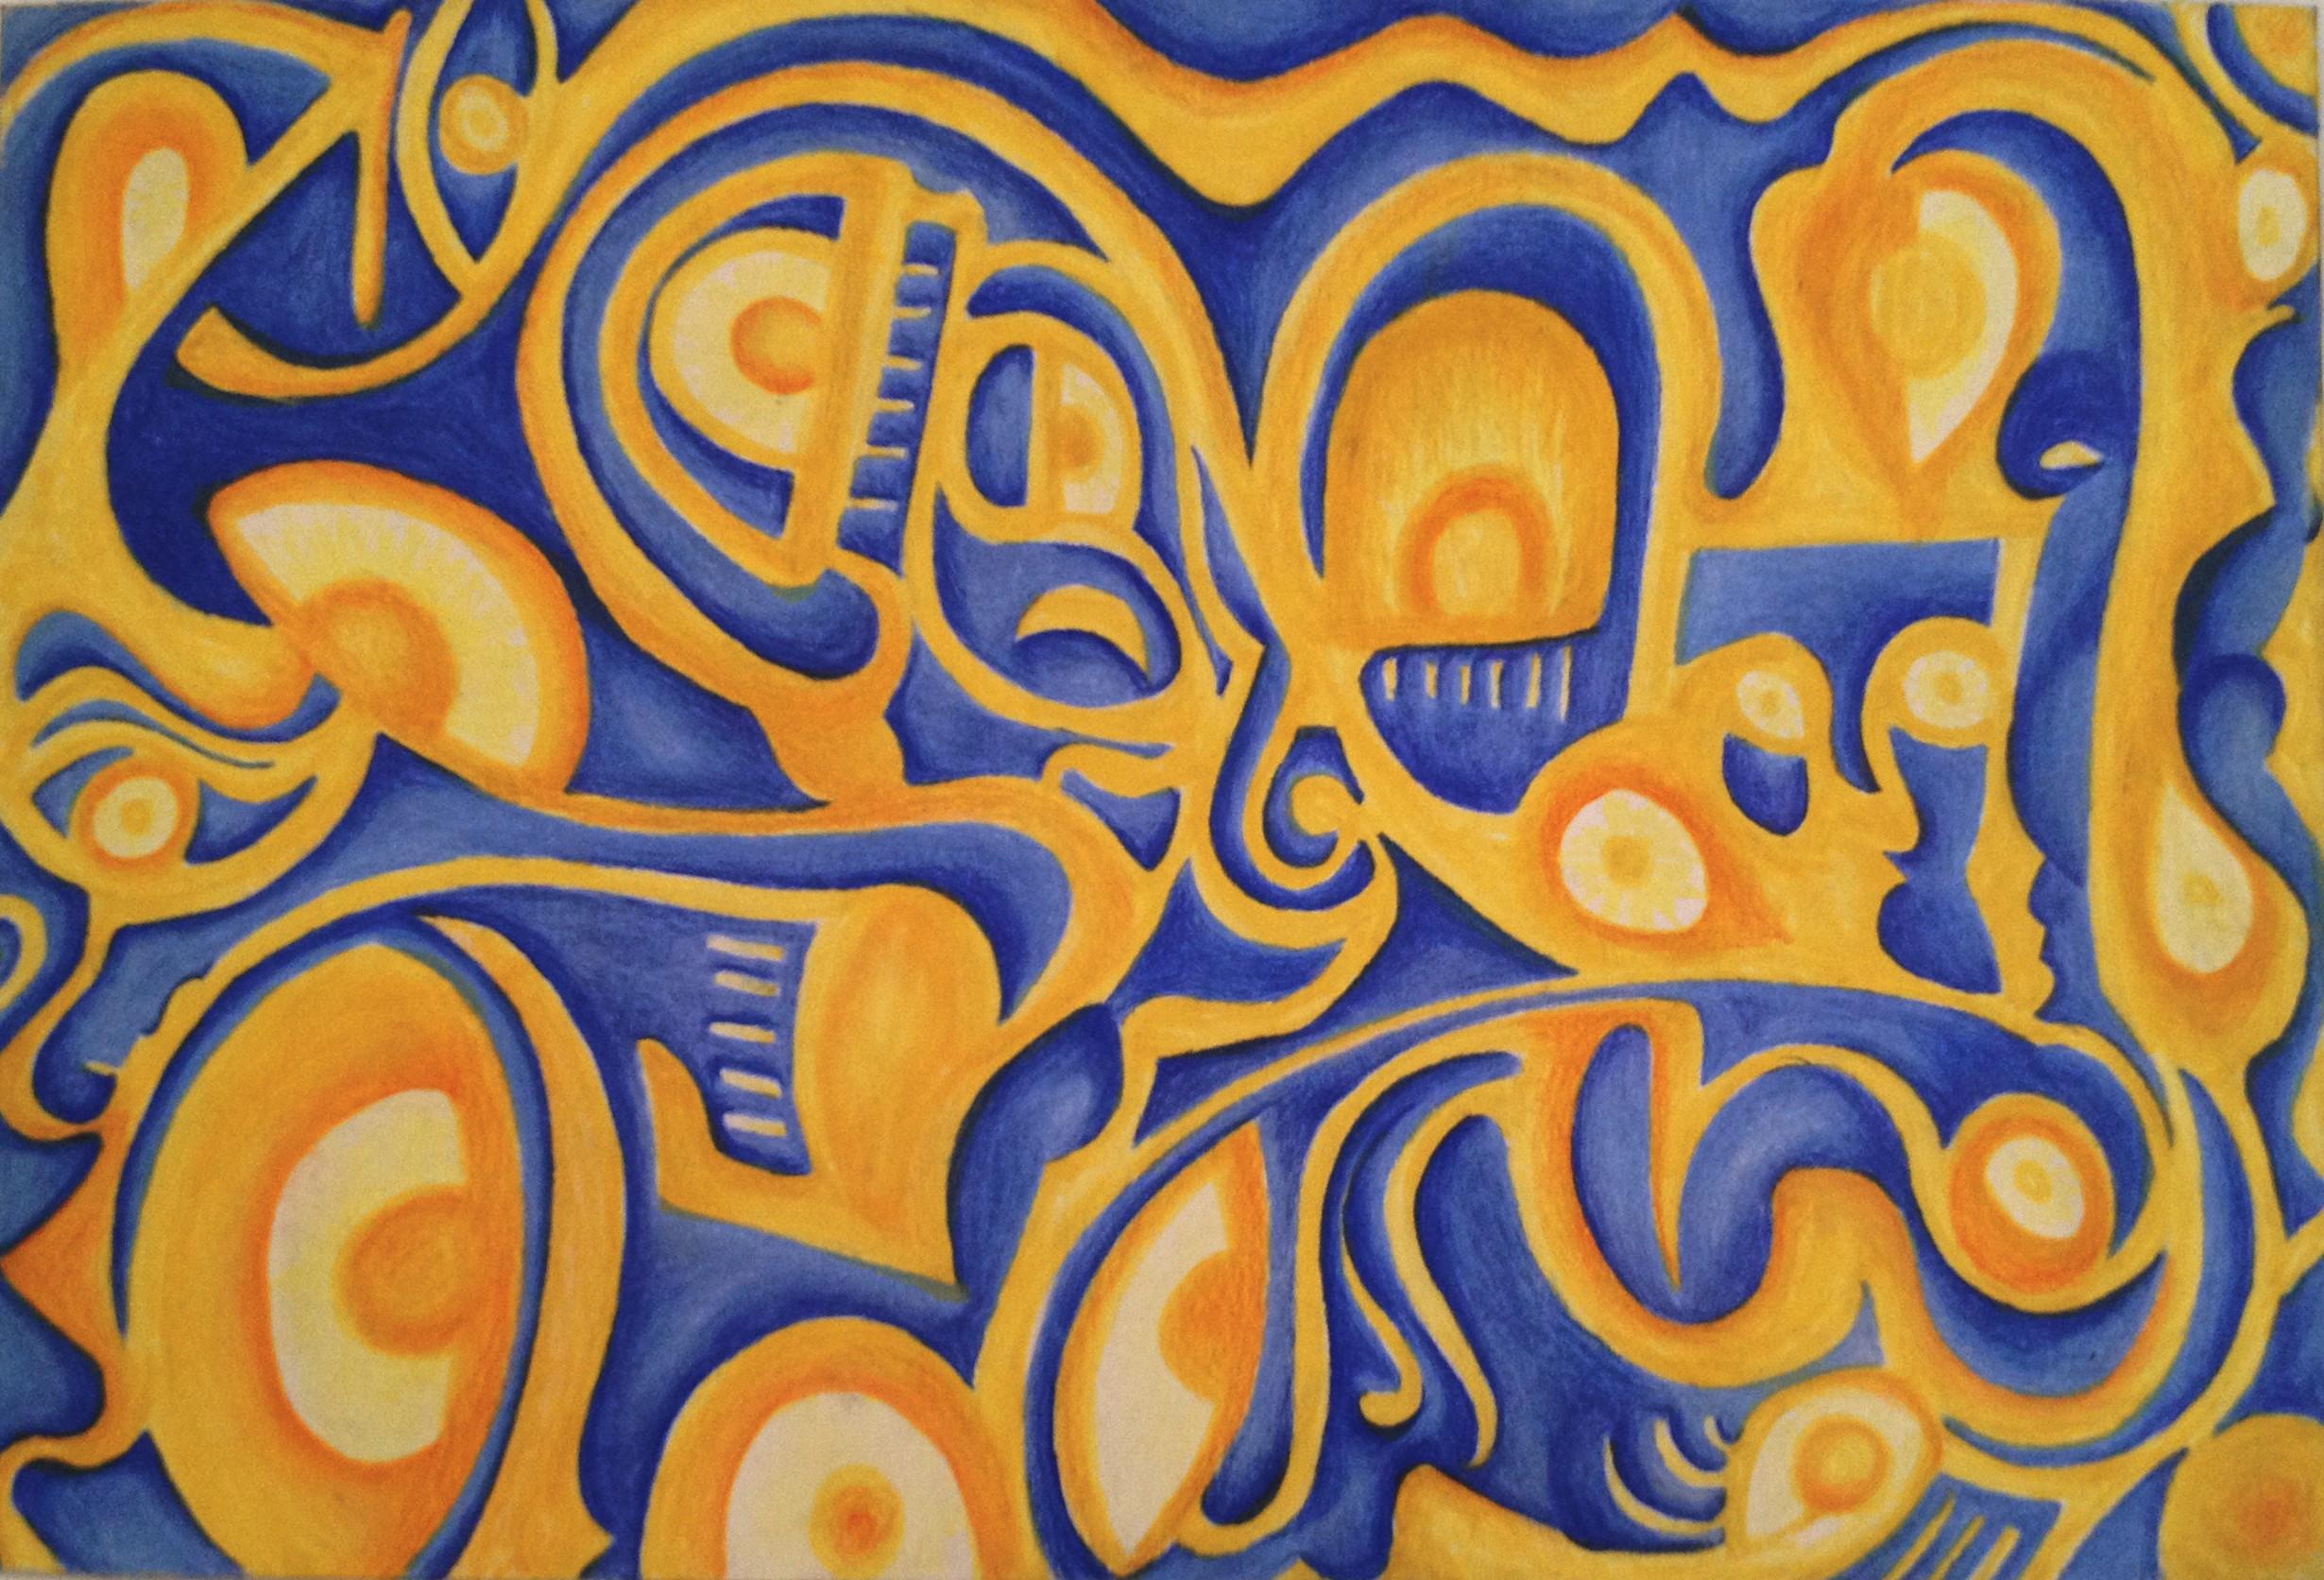 """Air In"" by Brian Nau                                                 Available at The Brian Nau Gallery"